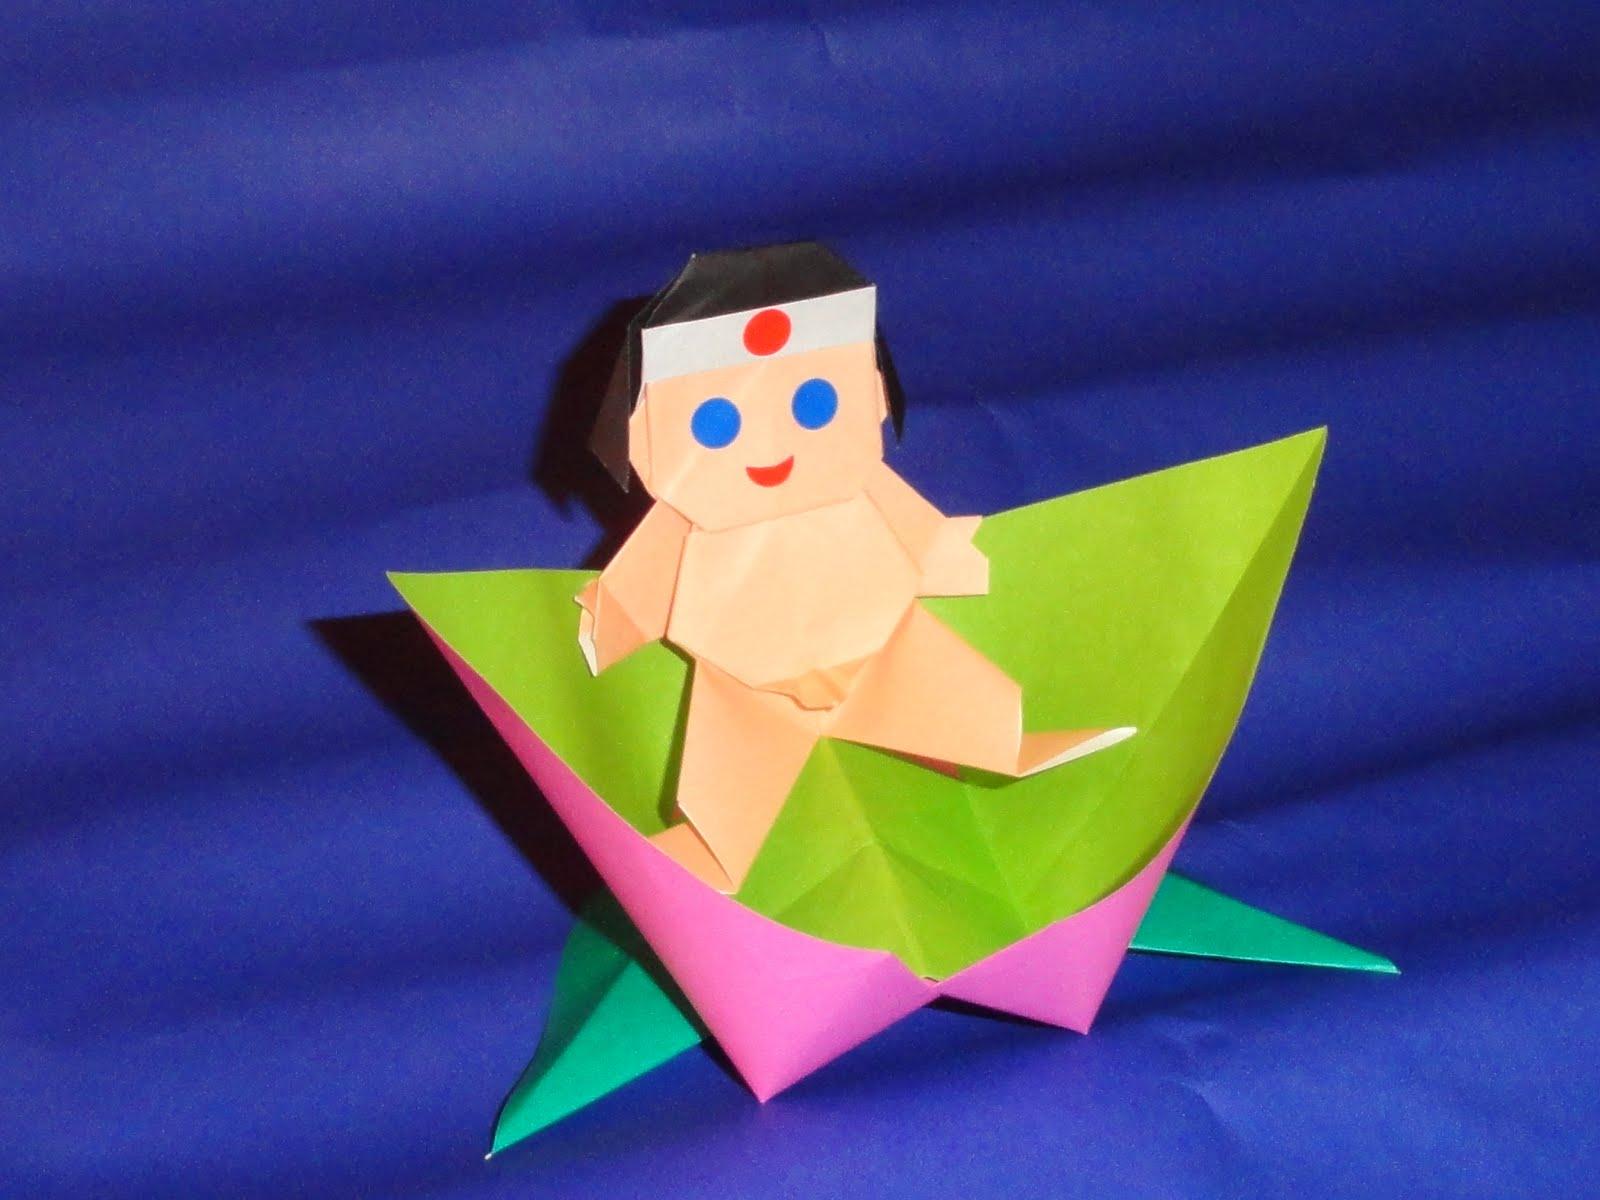 Have Paper Will Travel Momotaro Peach Boy Star Wars Origami Diagrams And Crease Patterns Starwarigami Saturday May 21 2011